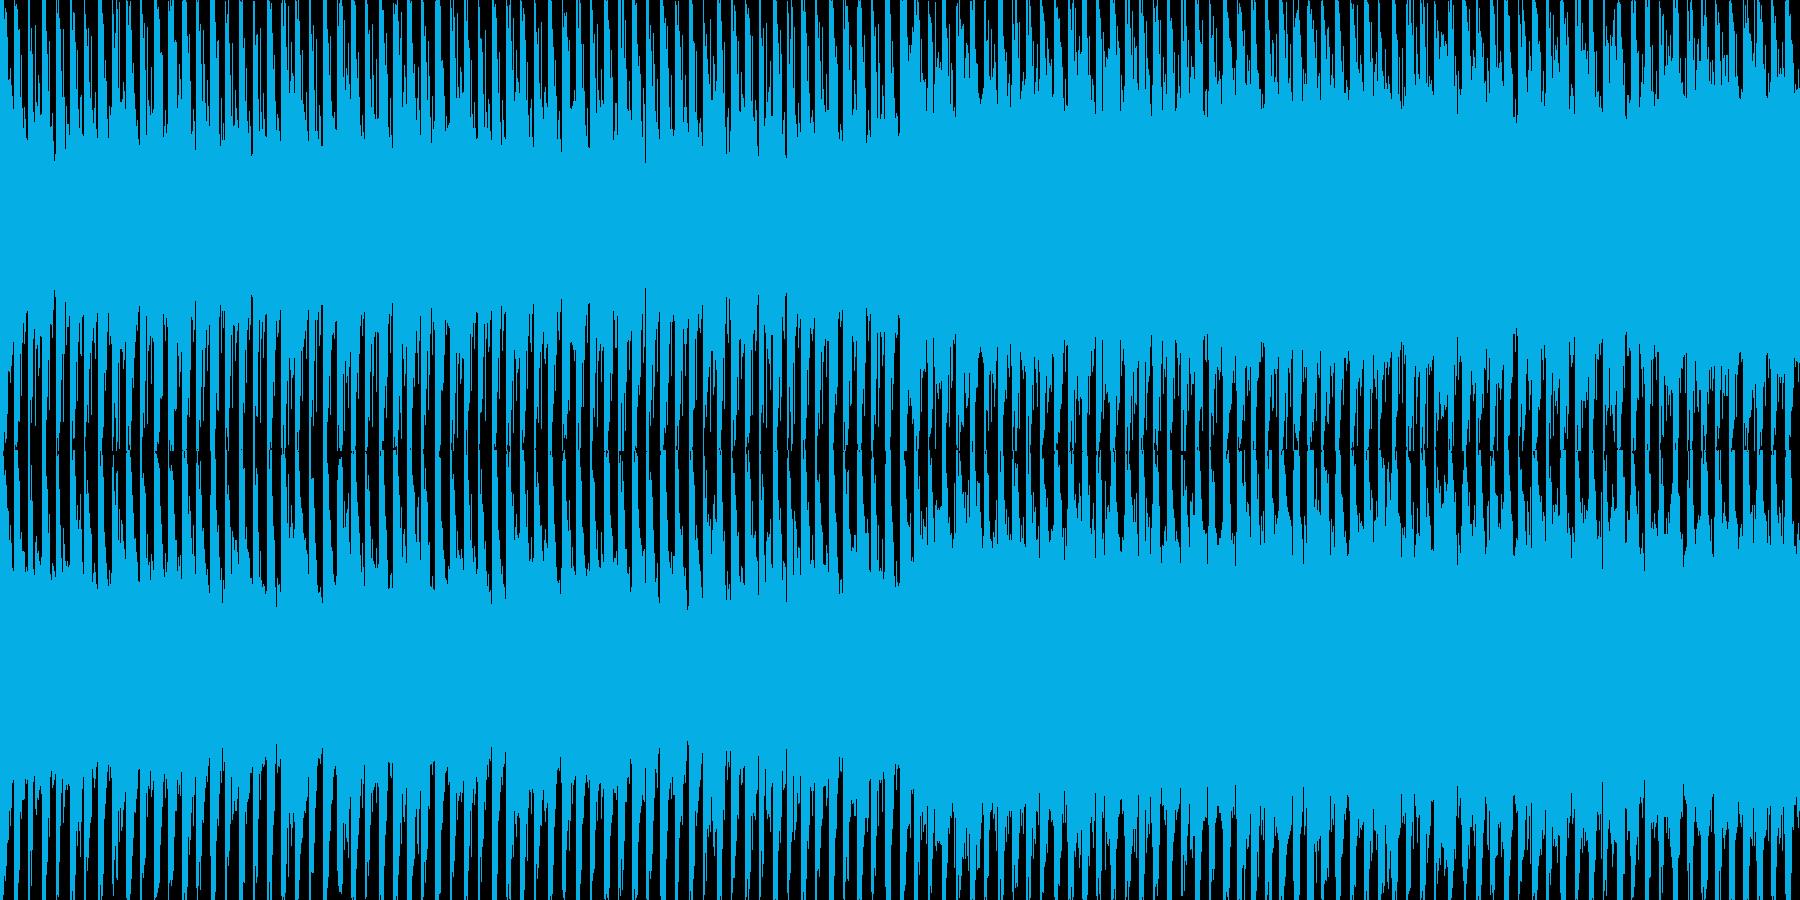 EDMクラブ系ダンスミュージック-127の再生済みの波形